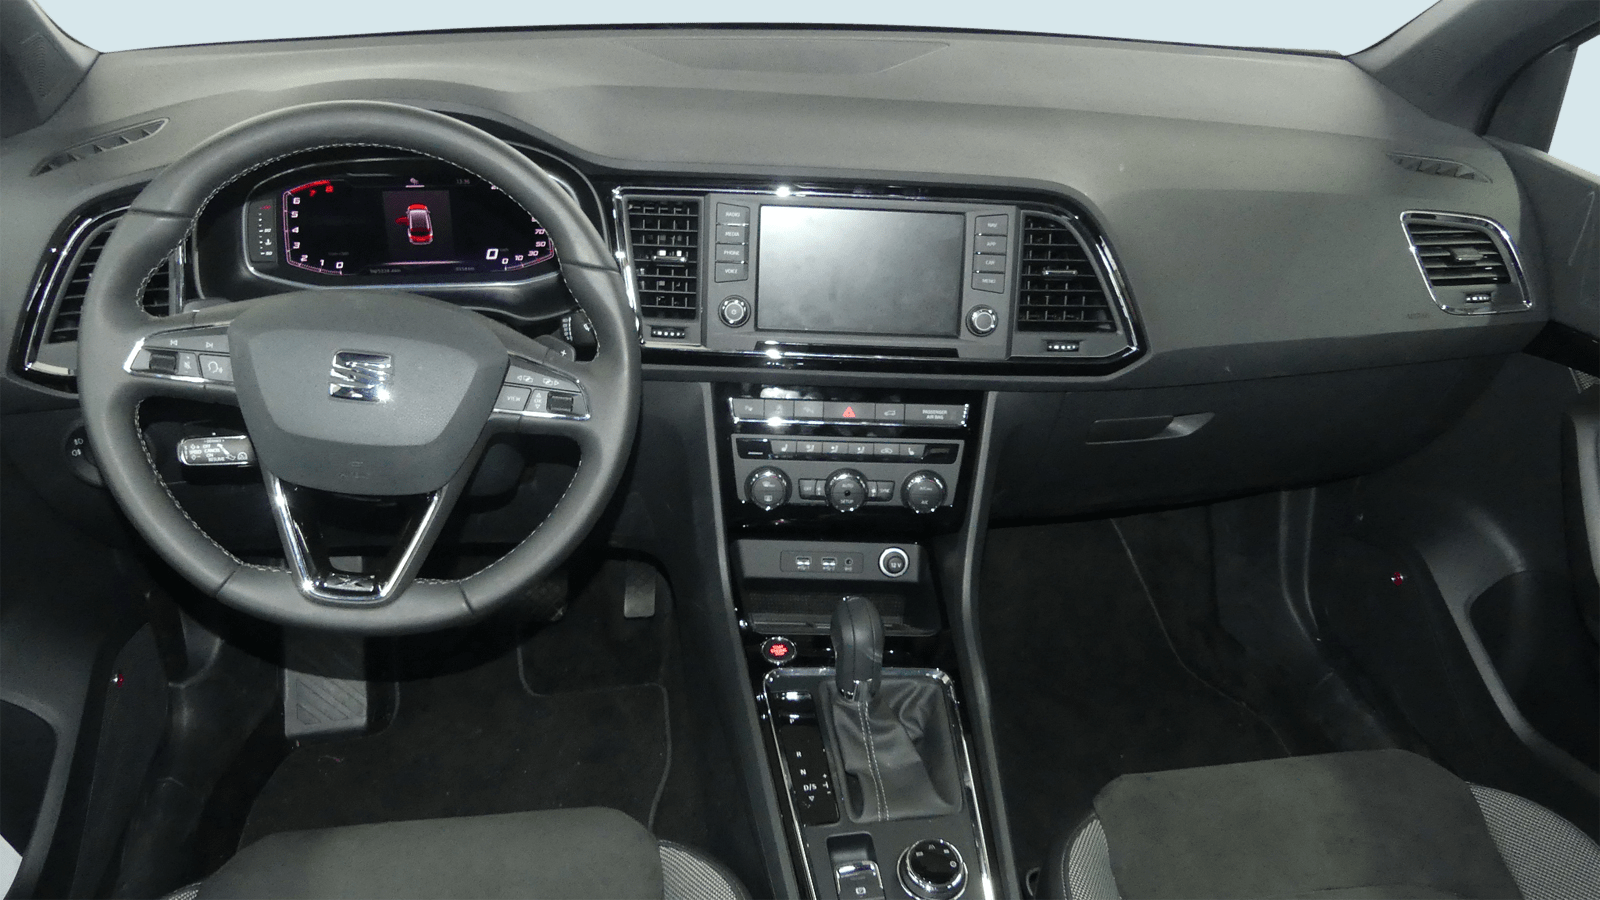 SEAT Ateca Schwarz interior - Clyde Auto-Abo